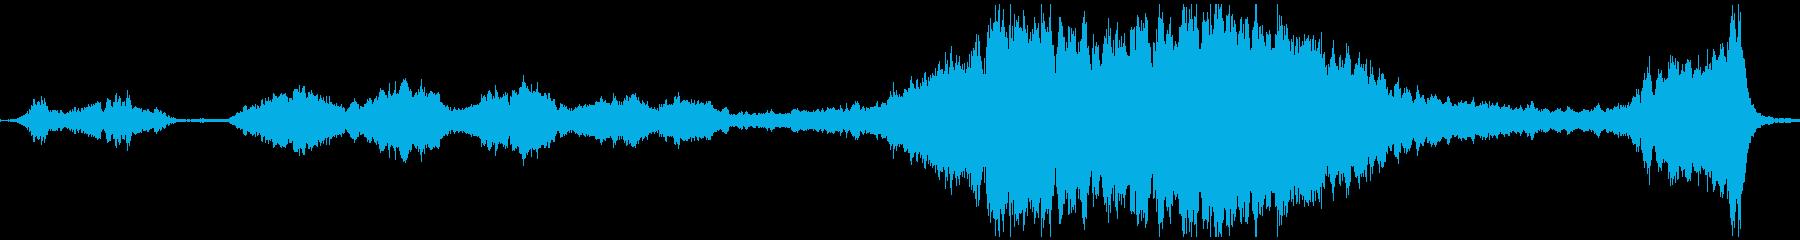 B/つらすぎる弦楽BGM・映像制作の再生済みの波形